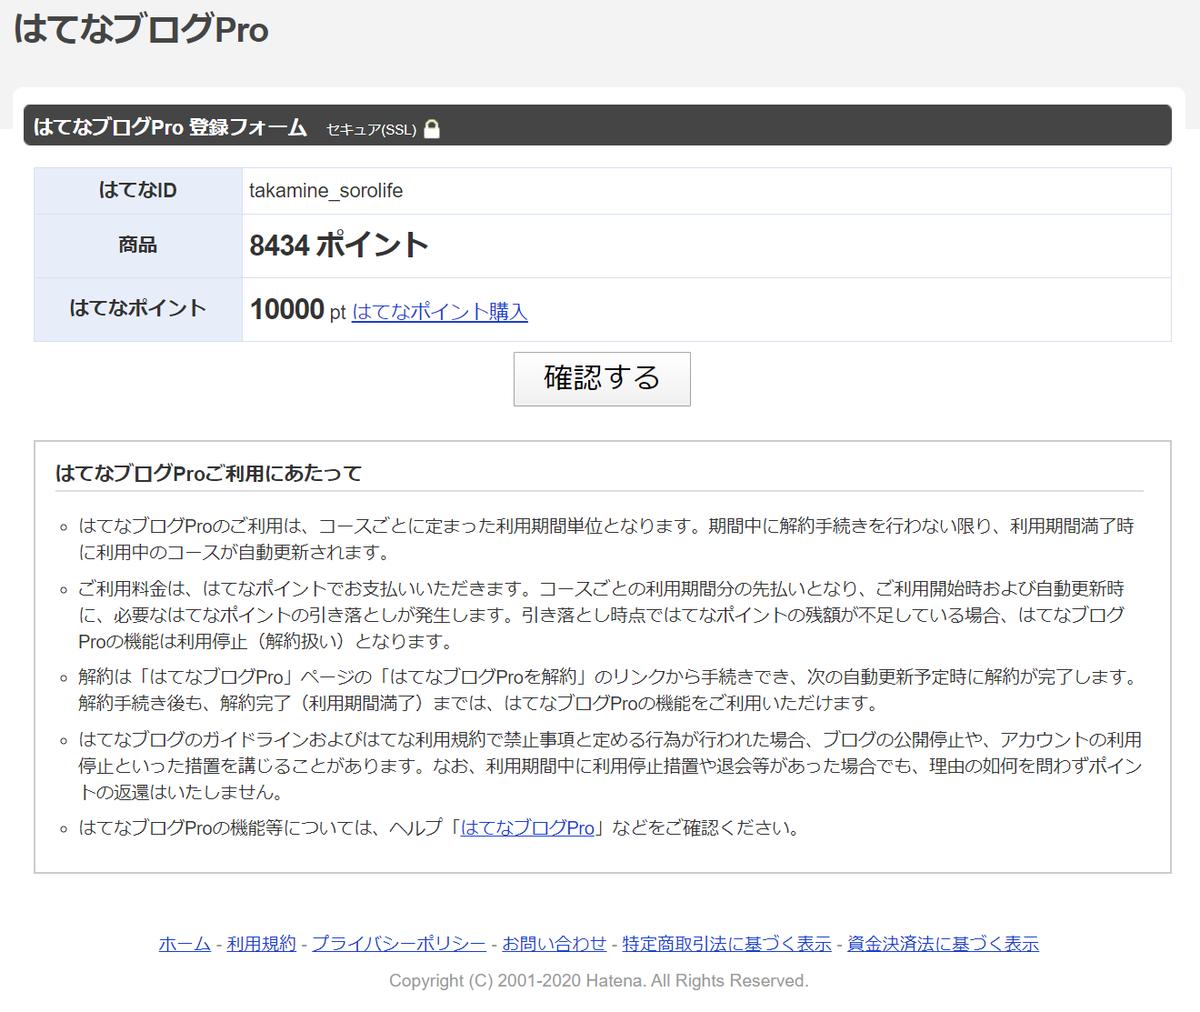 f:id:takamine_sorolife:20200401173341p:plain